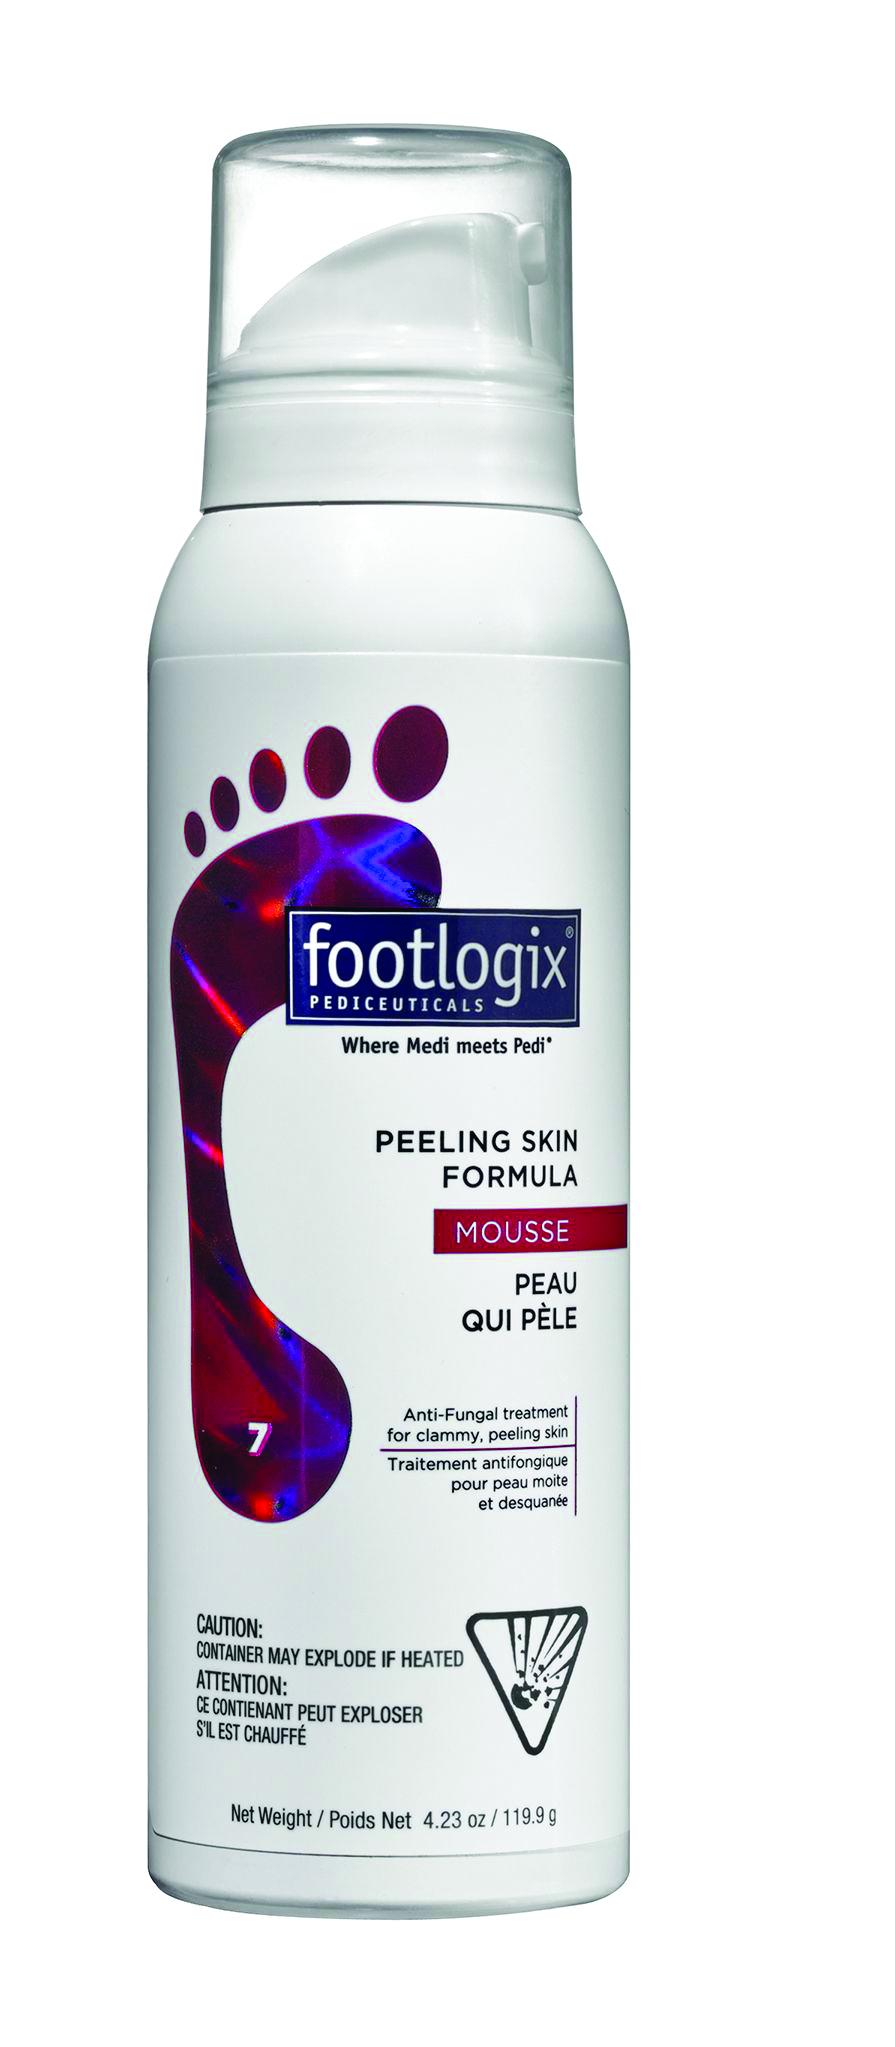 Peeling Skin Formula